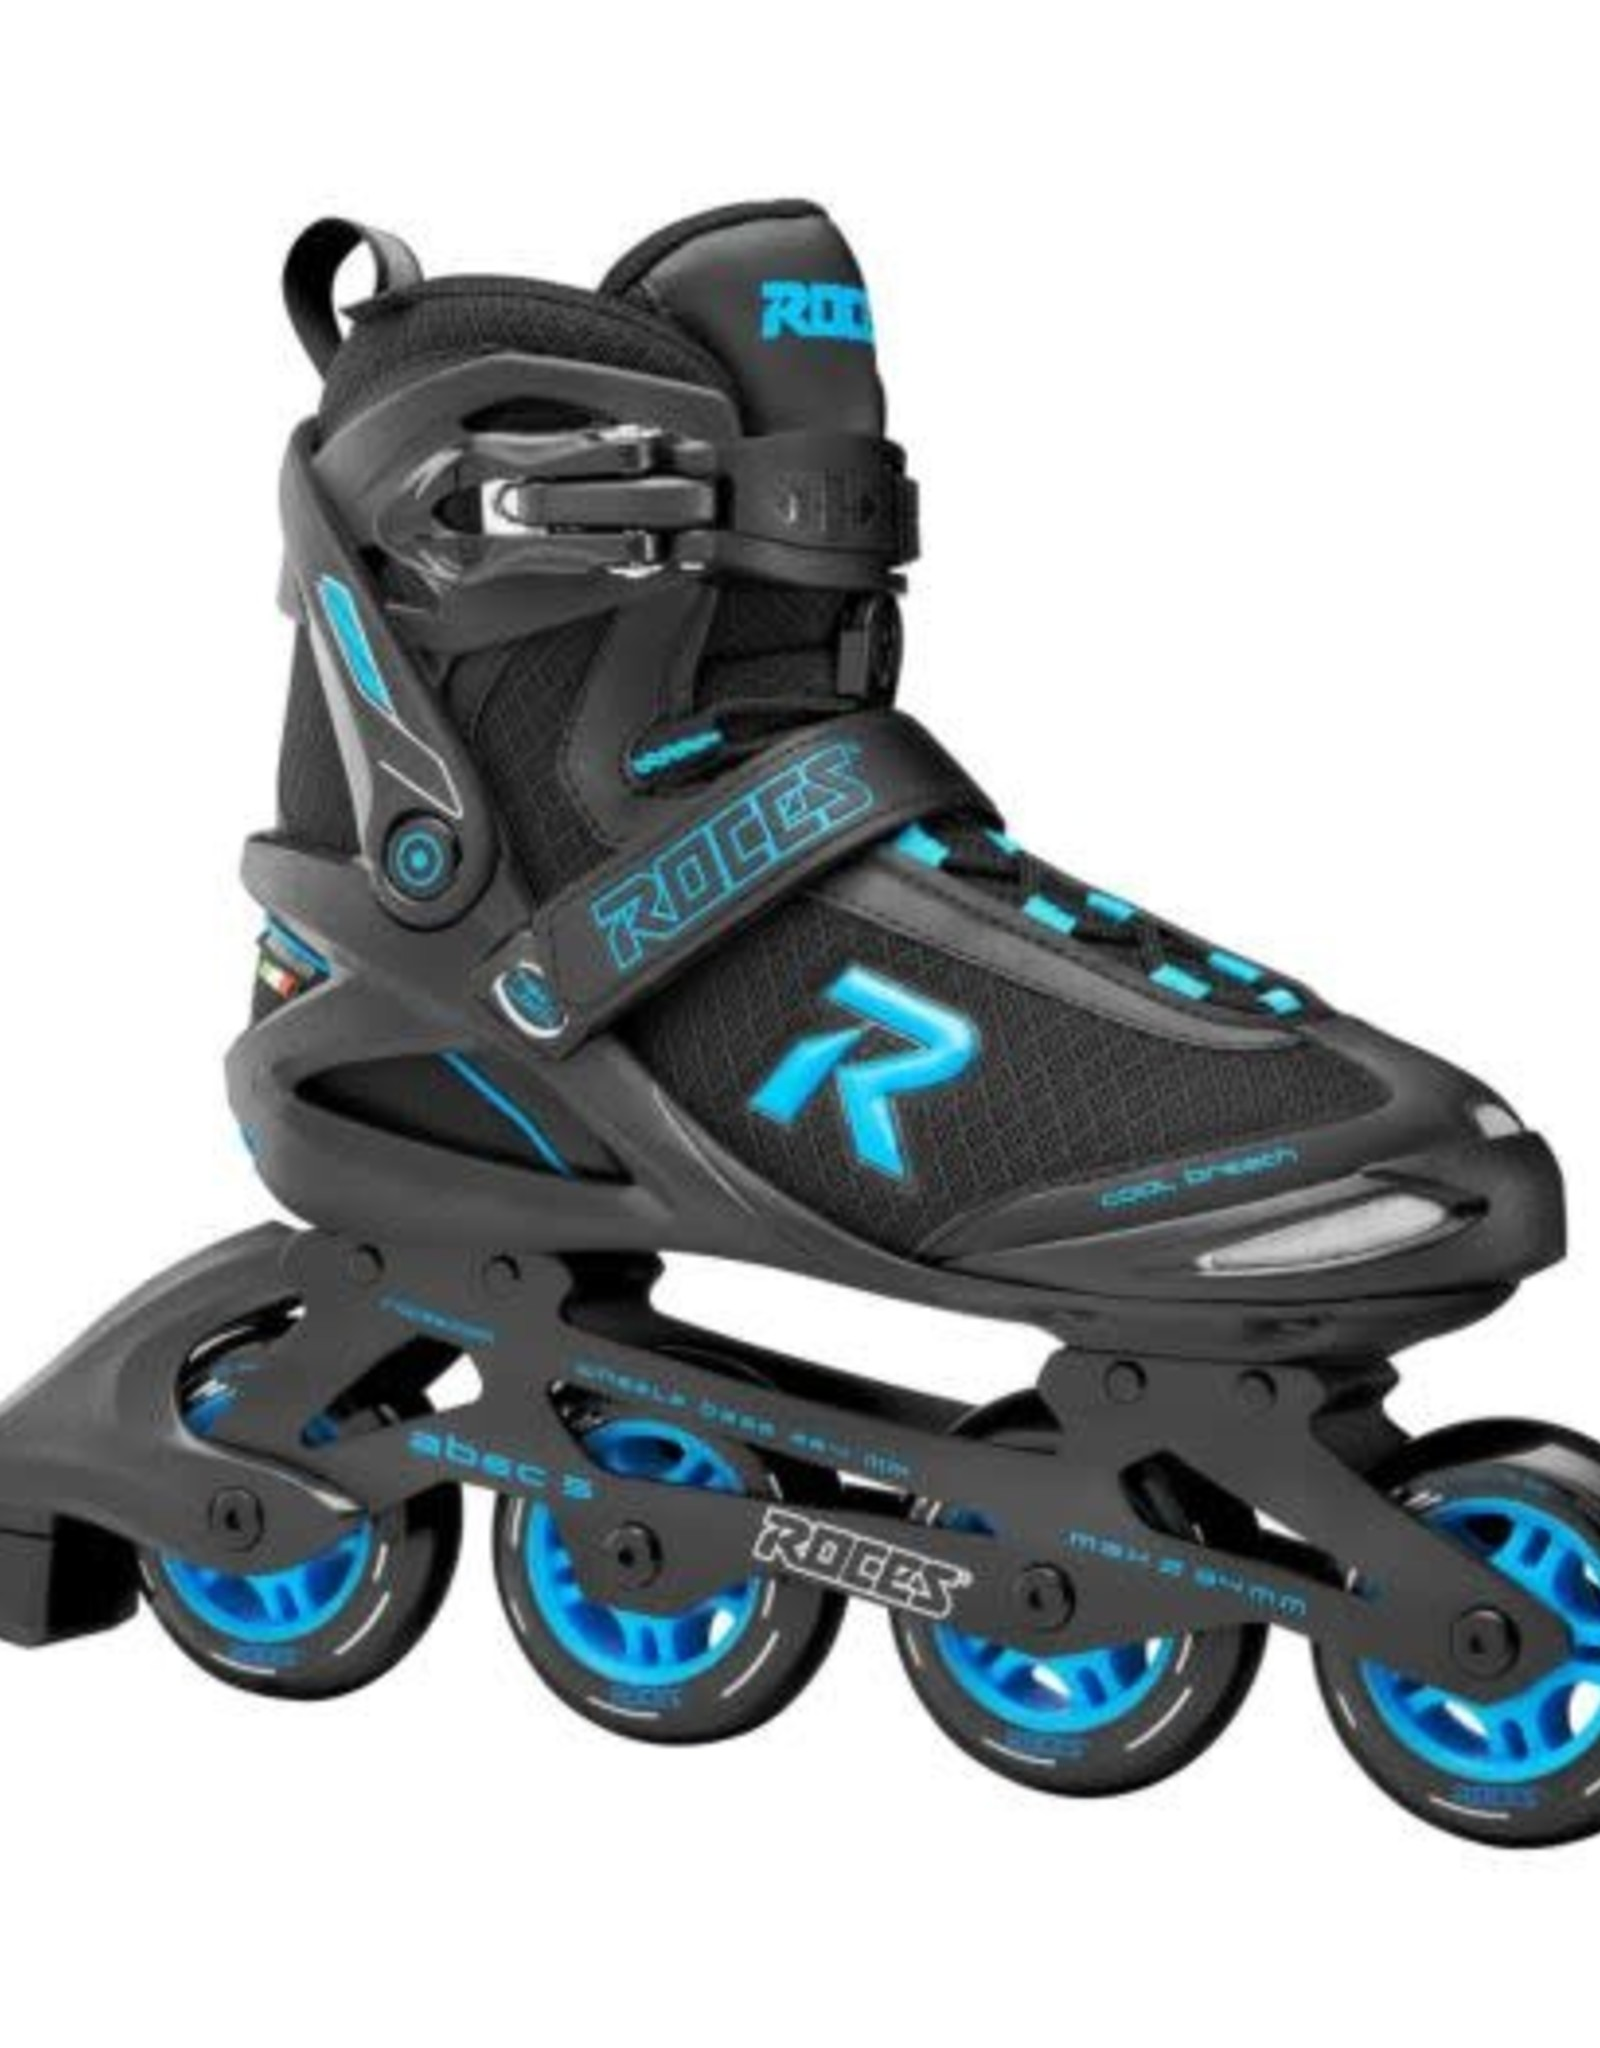 Roces Roces Sign 80 inline skates